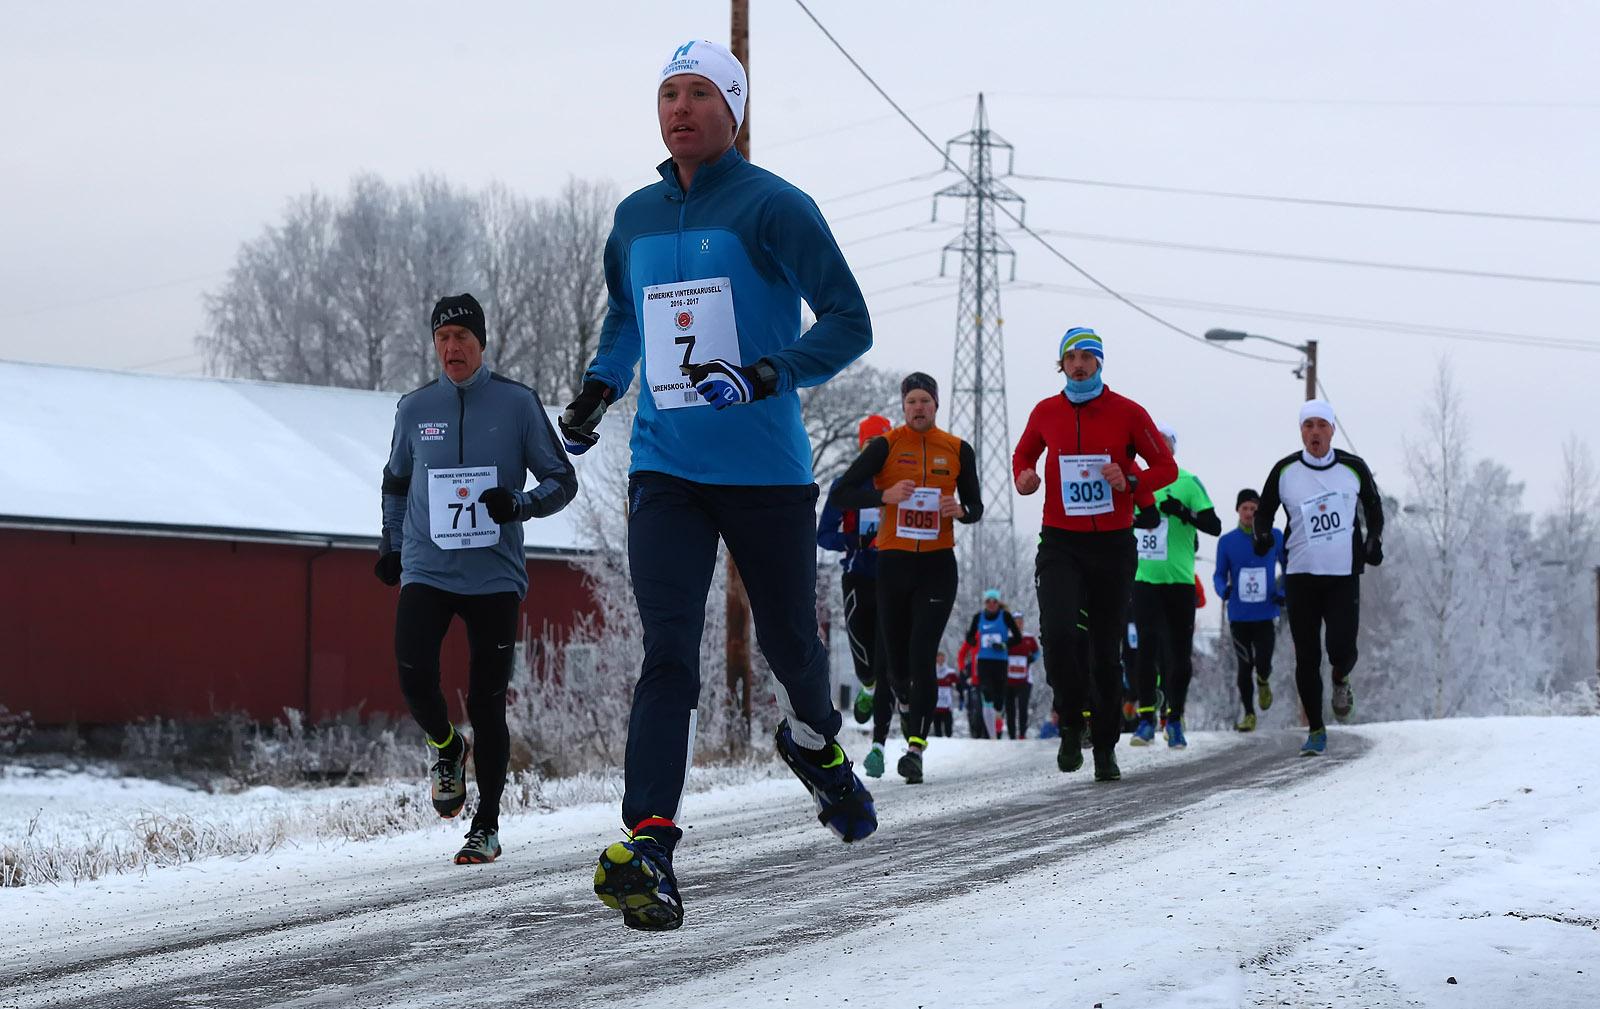 Bingenrunden-12112016-Ole-Jakob-Michelsen.jpg